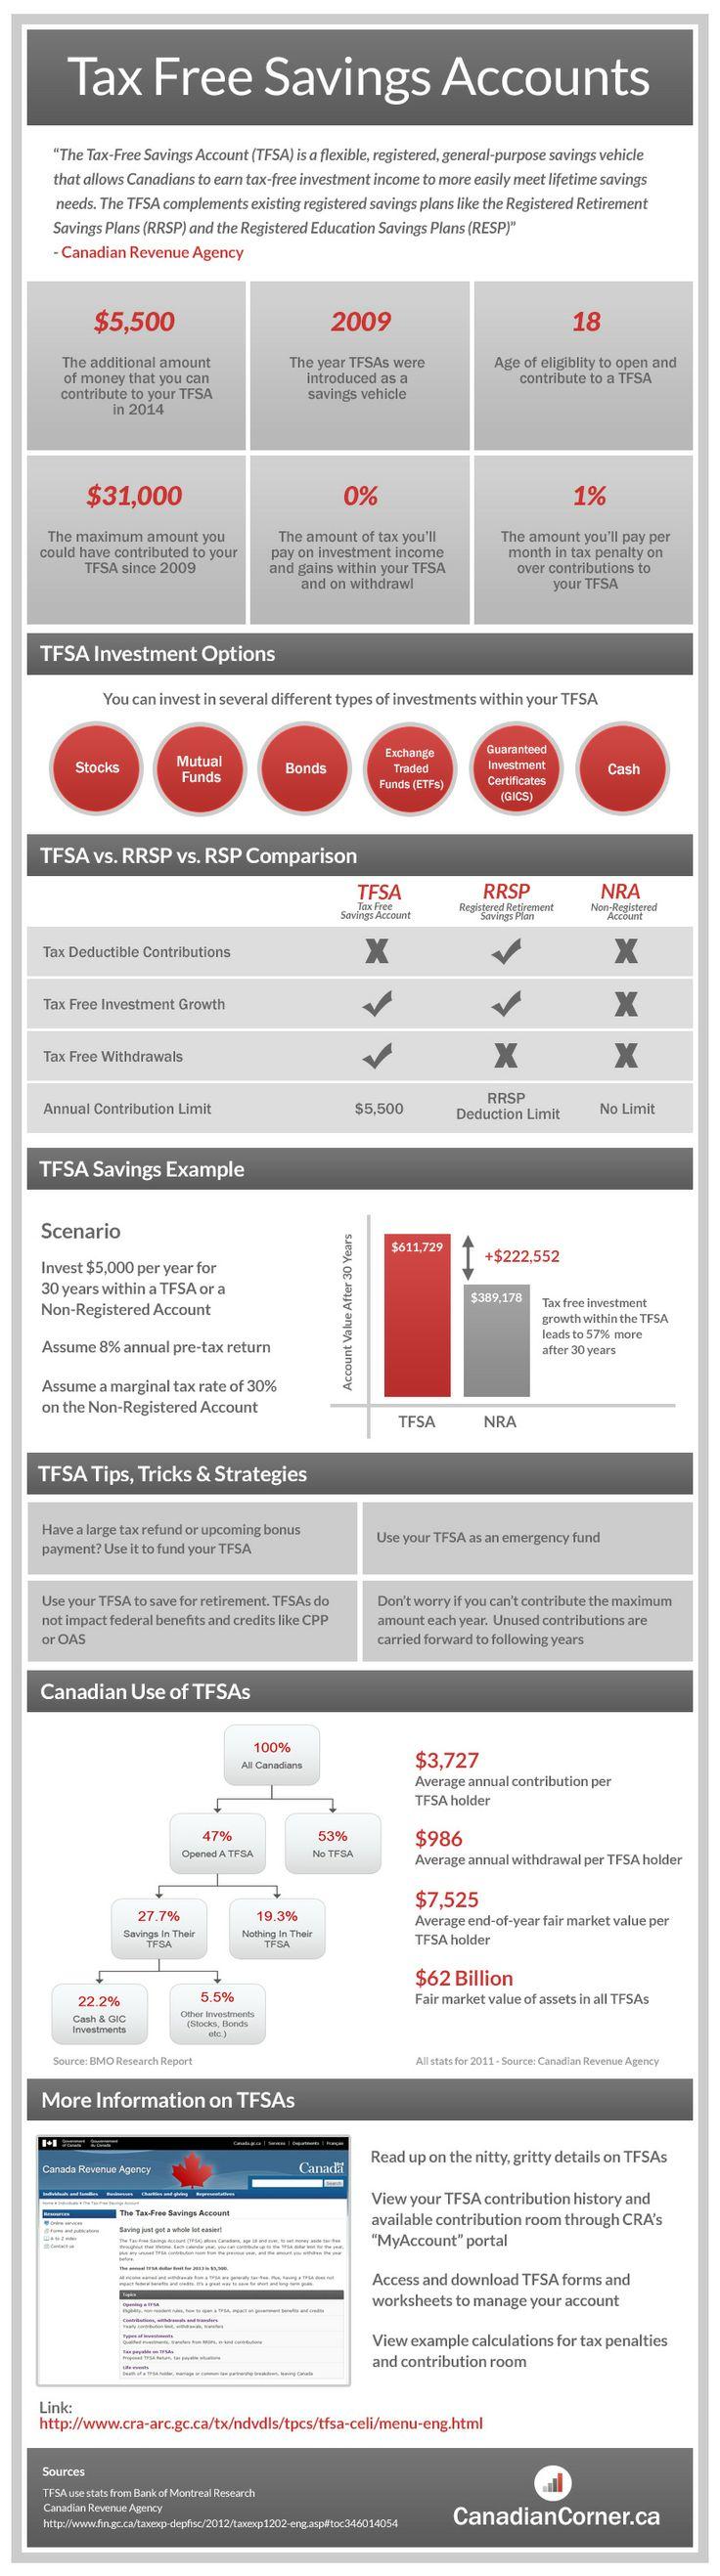 Tax Free Savings Account Infographic